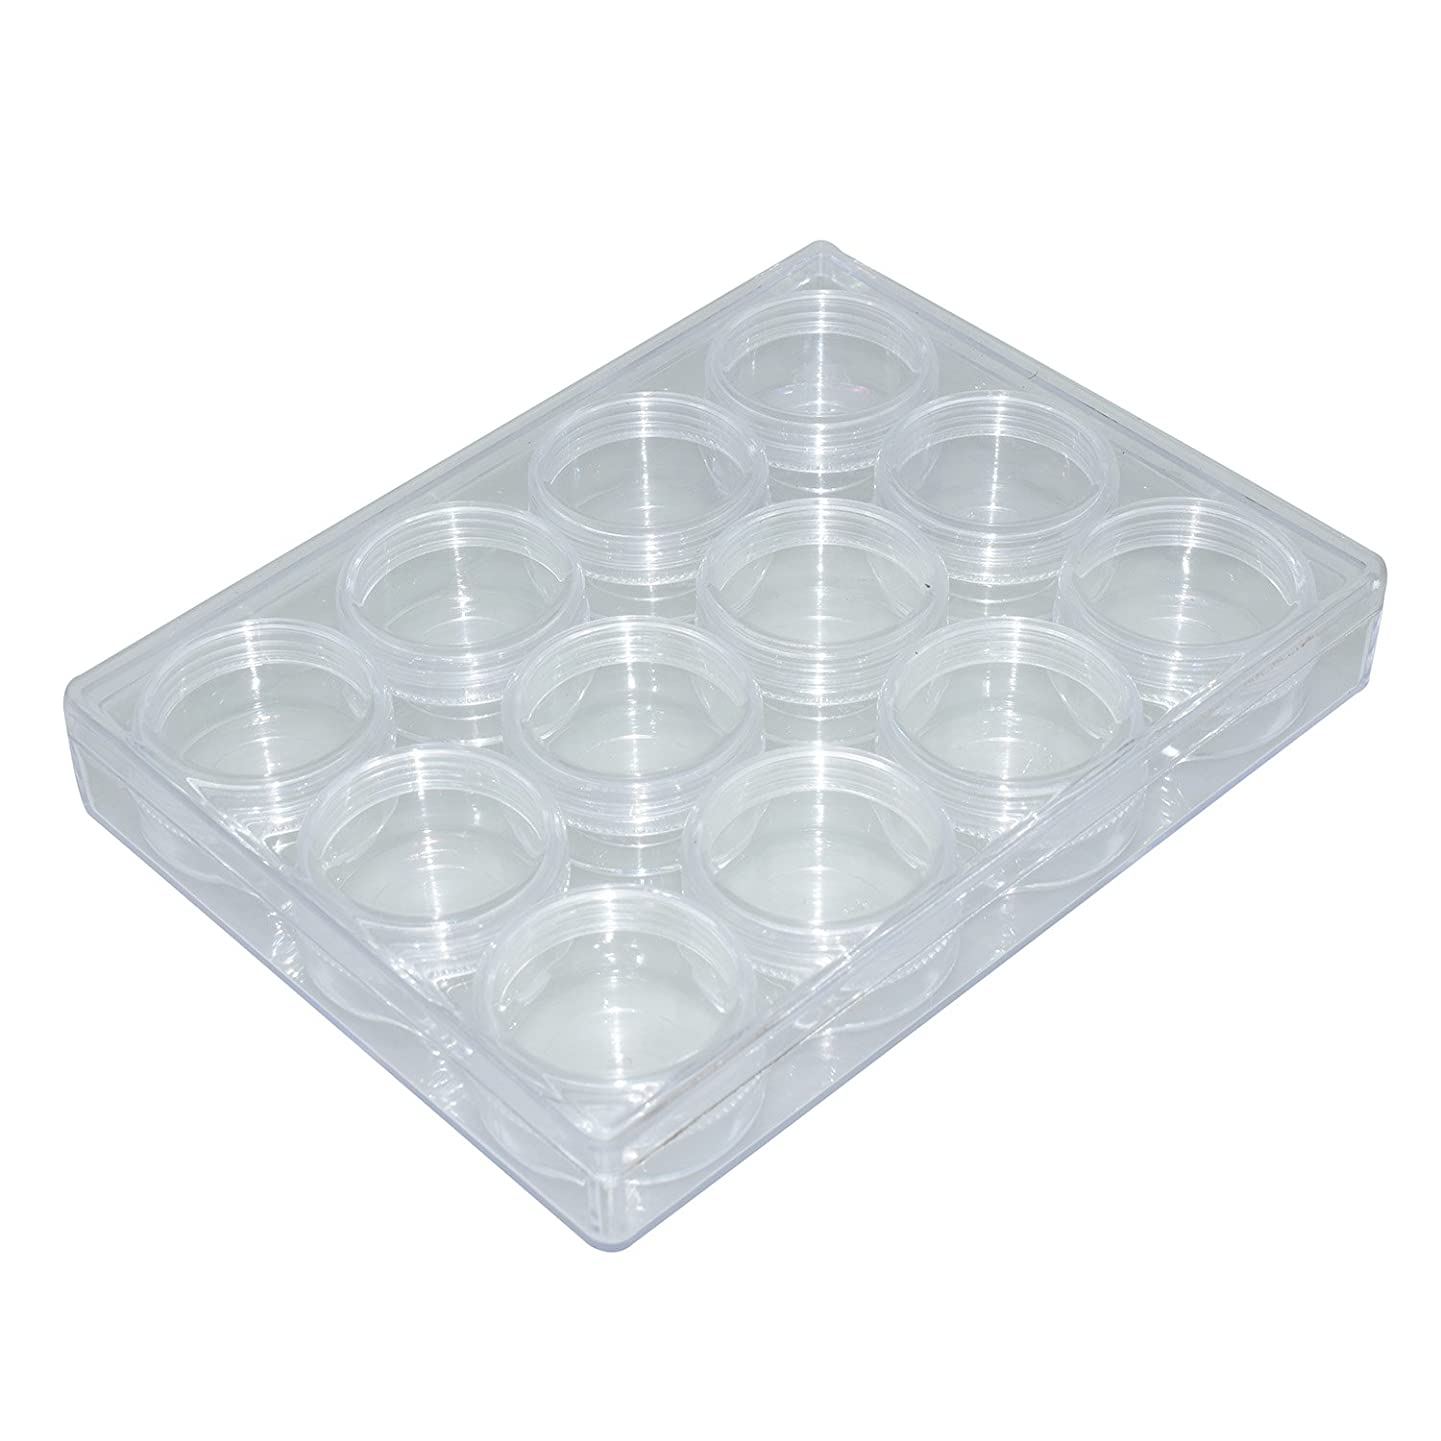 Argositment 12pcs Mid Round Plastic Bead Storage Container Display Organization Tins